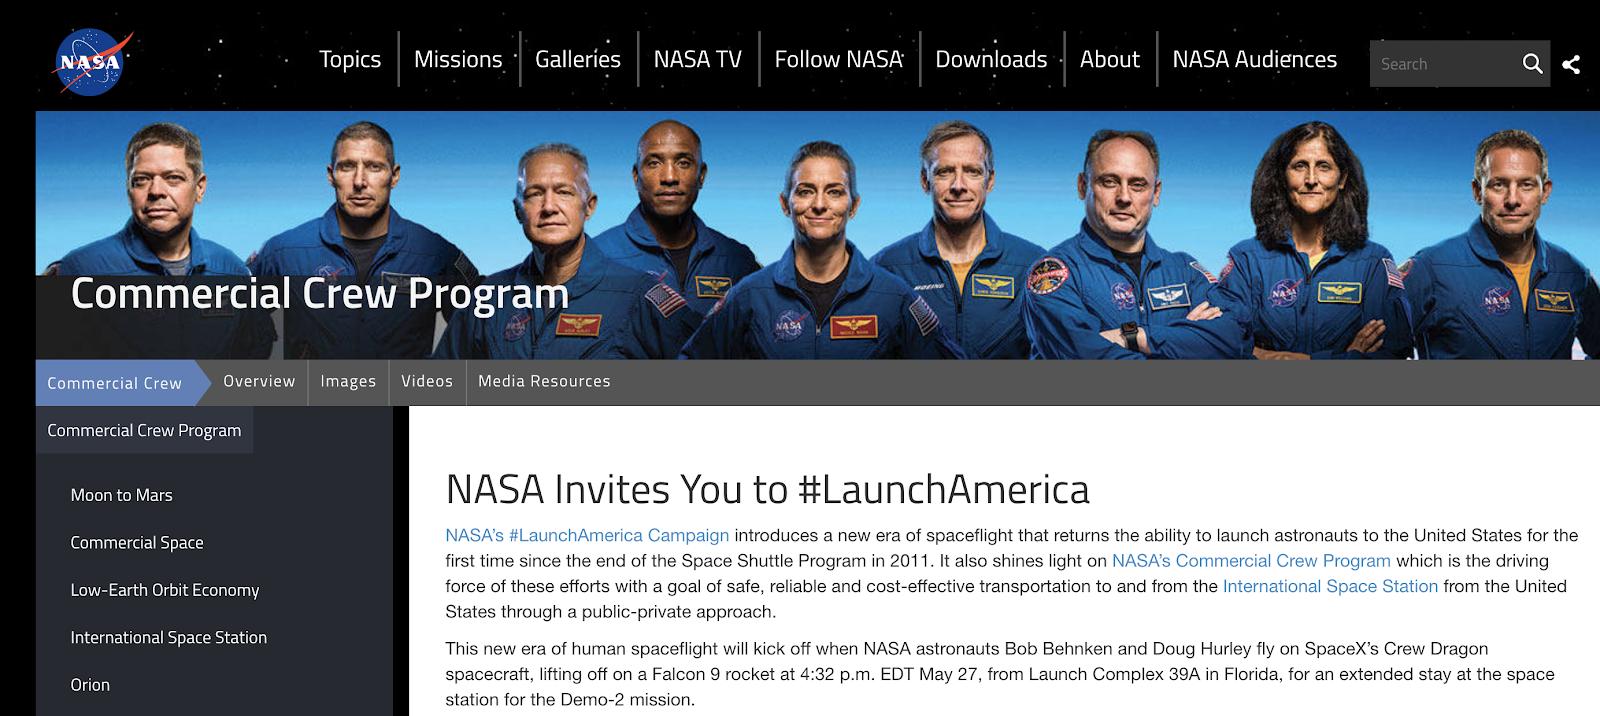 Nasa Example of Using Hashtags on Twitter (Screenshot)